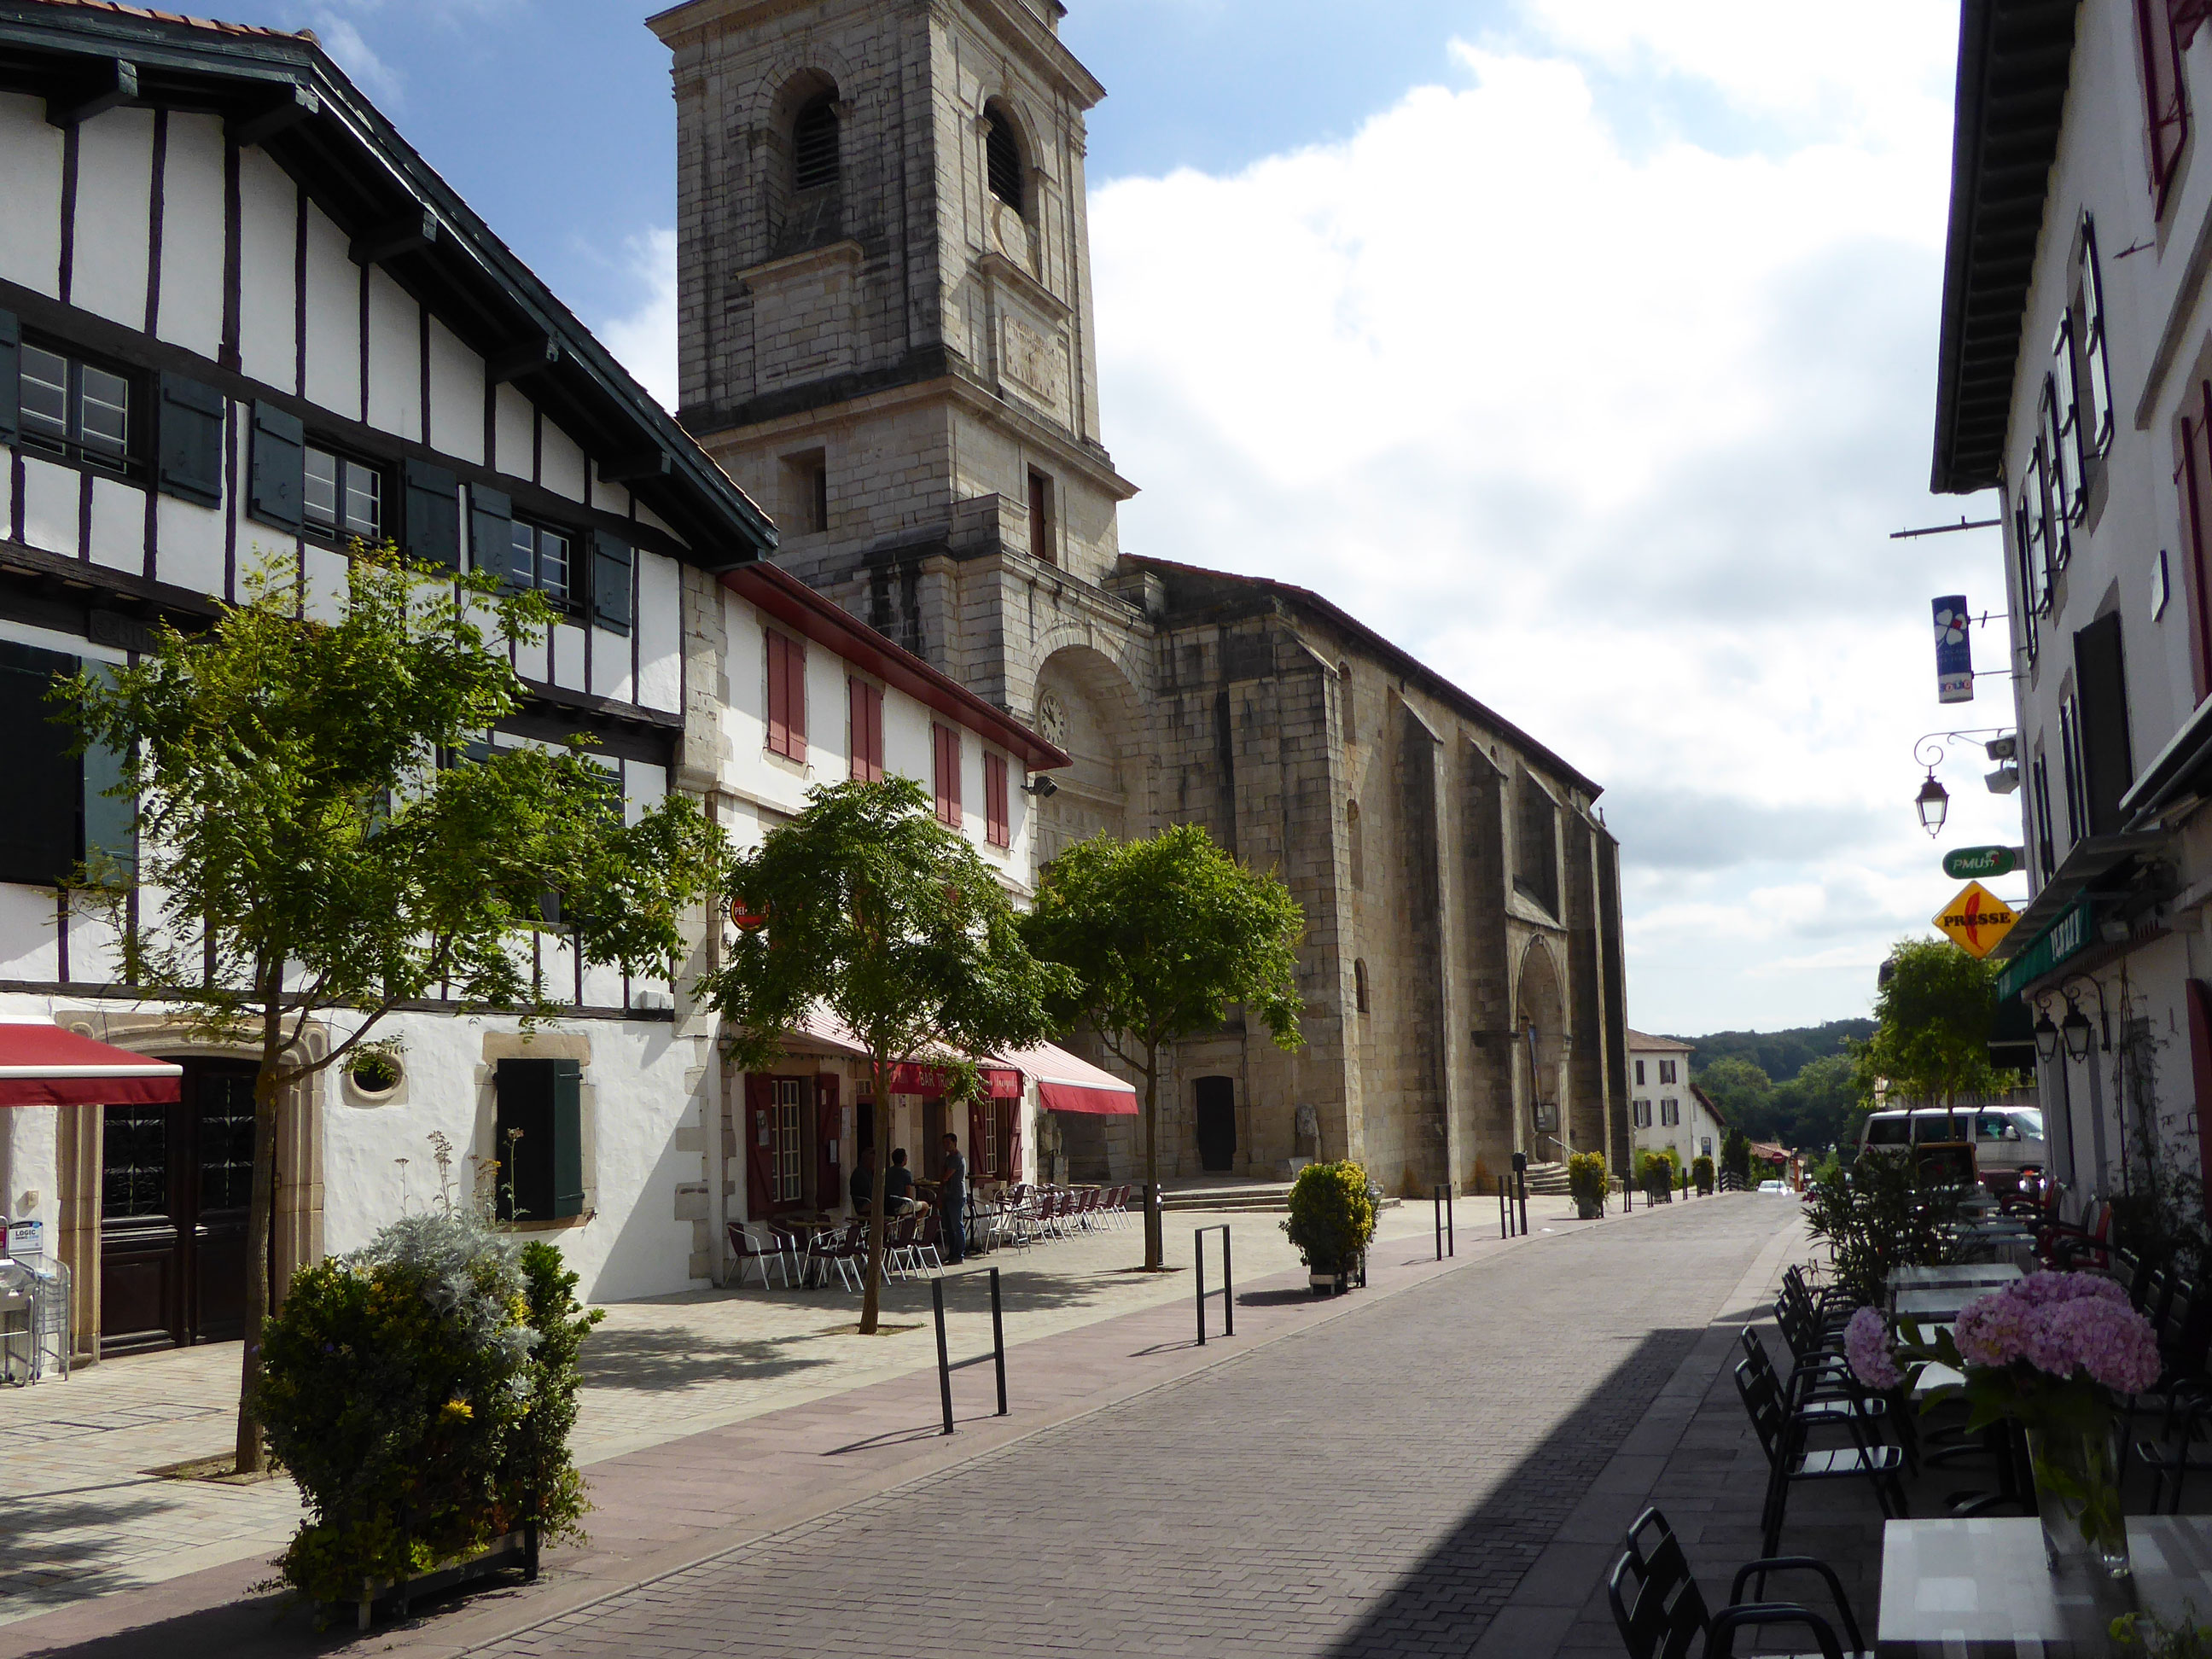 Floriparc, Urrugne centre bourg